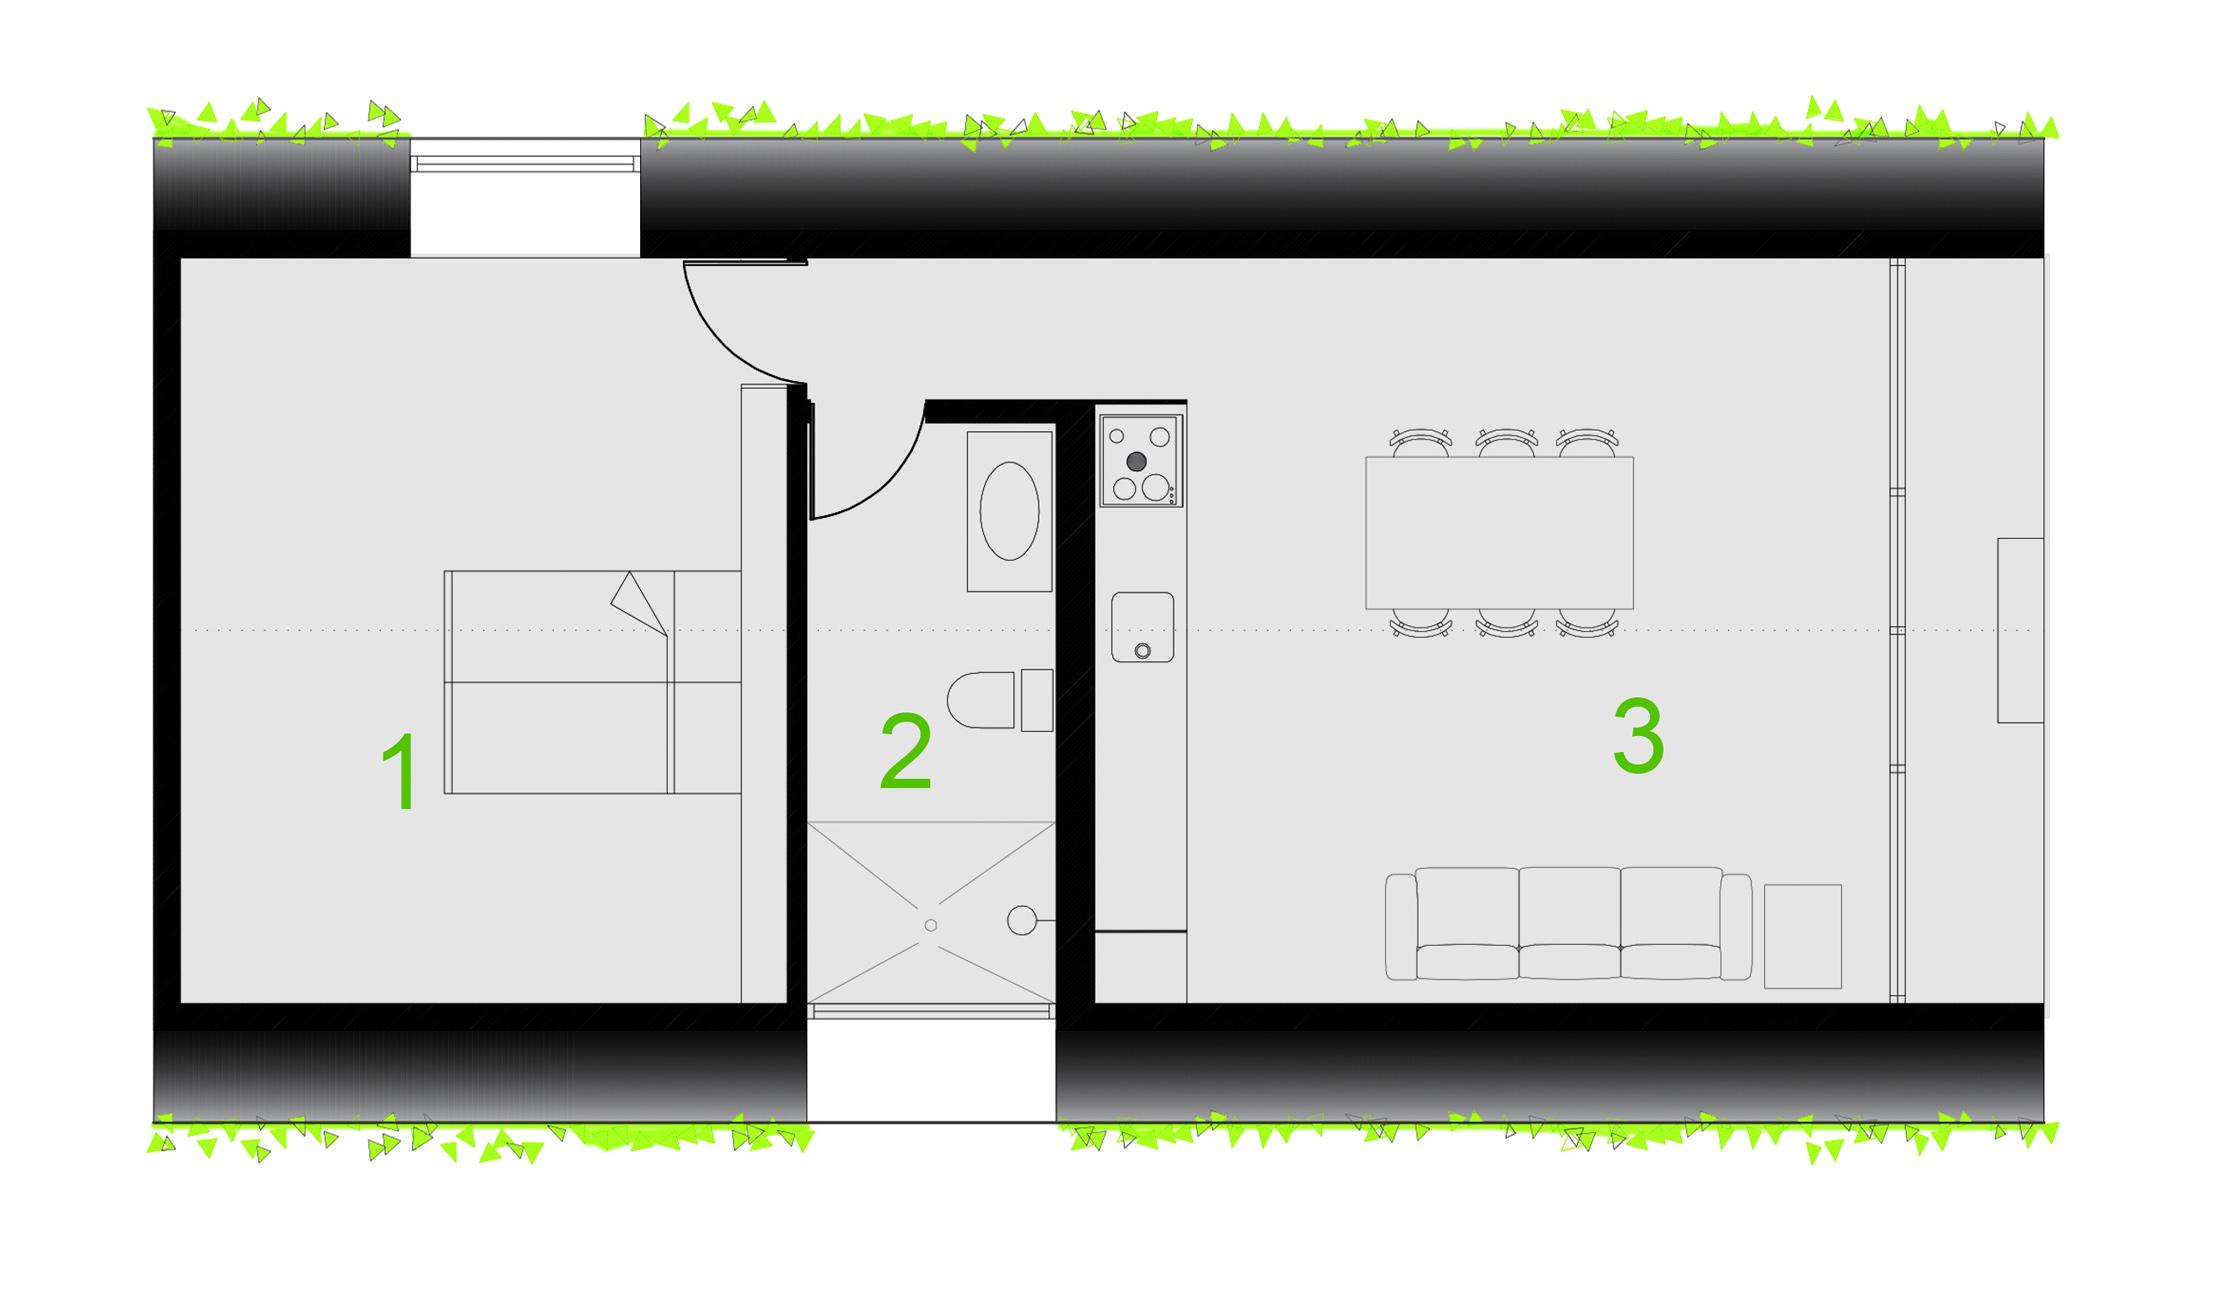 1- BEDROOM . 2-BATHROOM . 3-KITCHEN AND LIVING ROOM